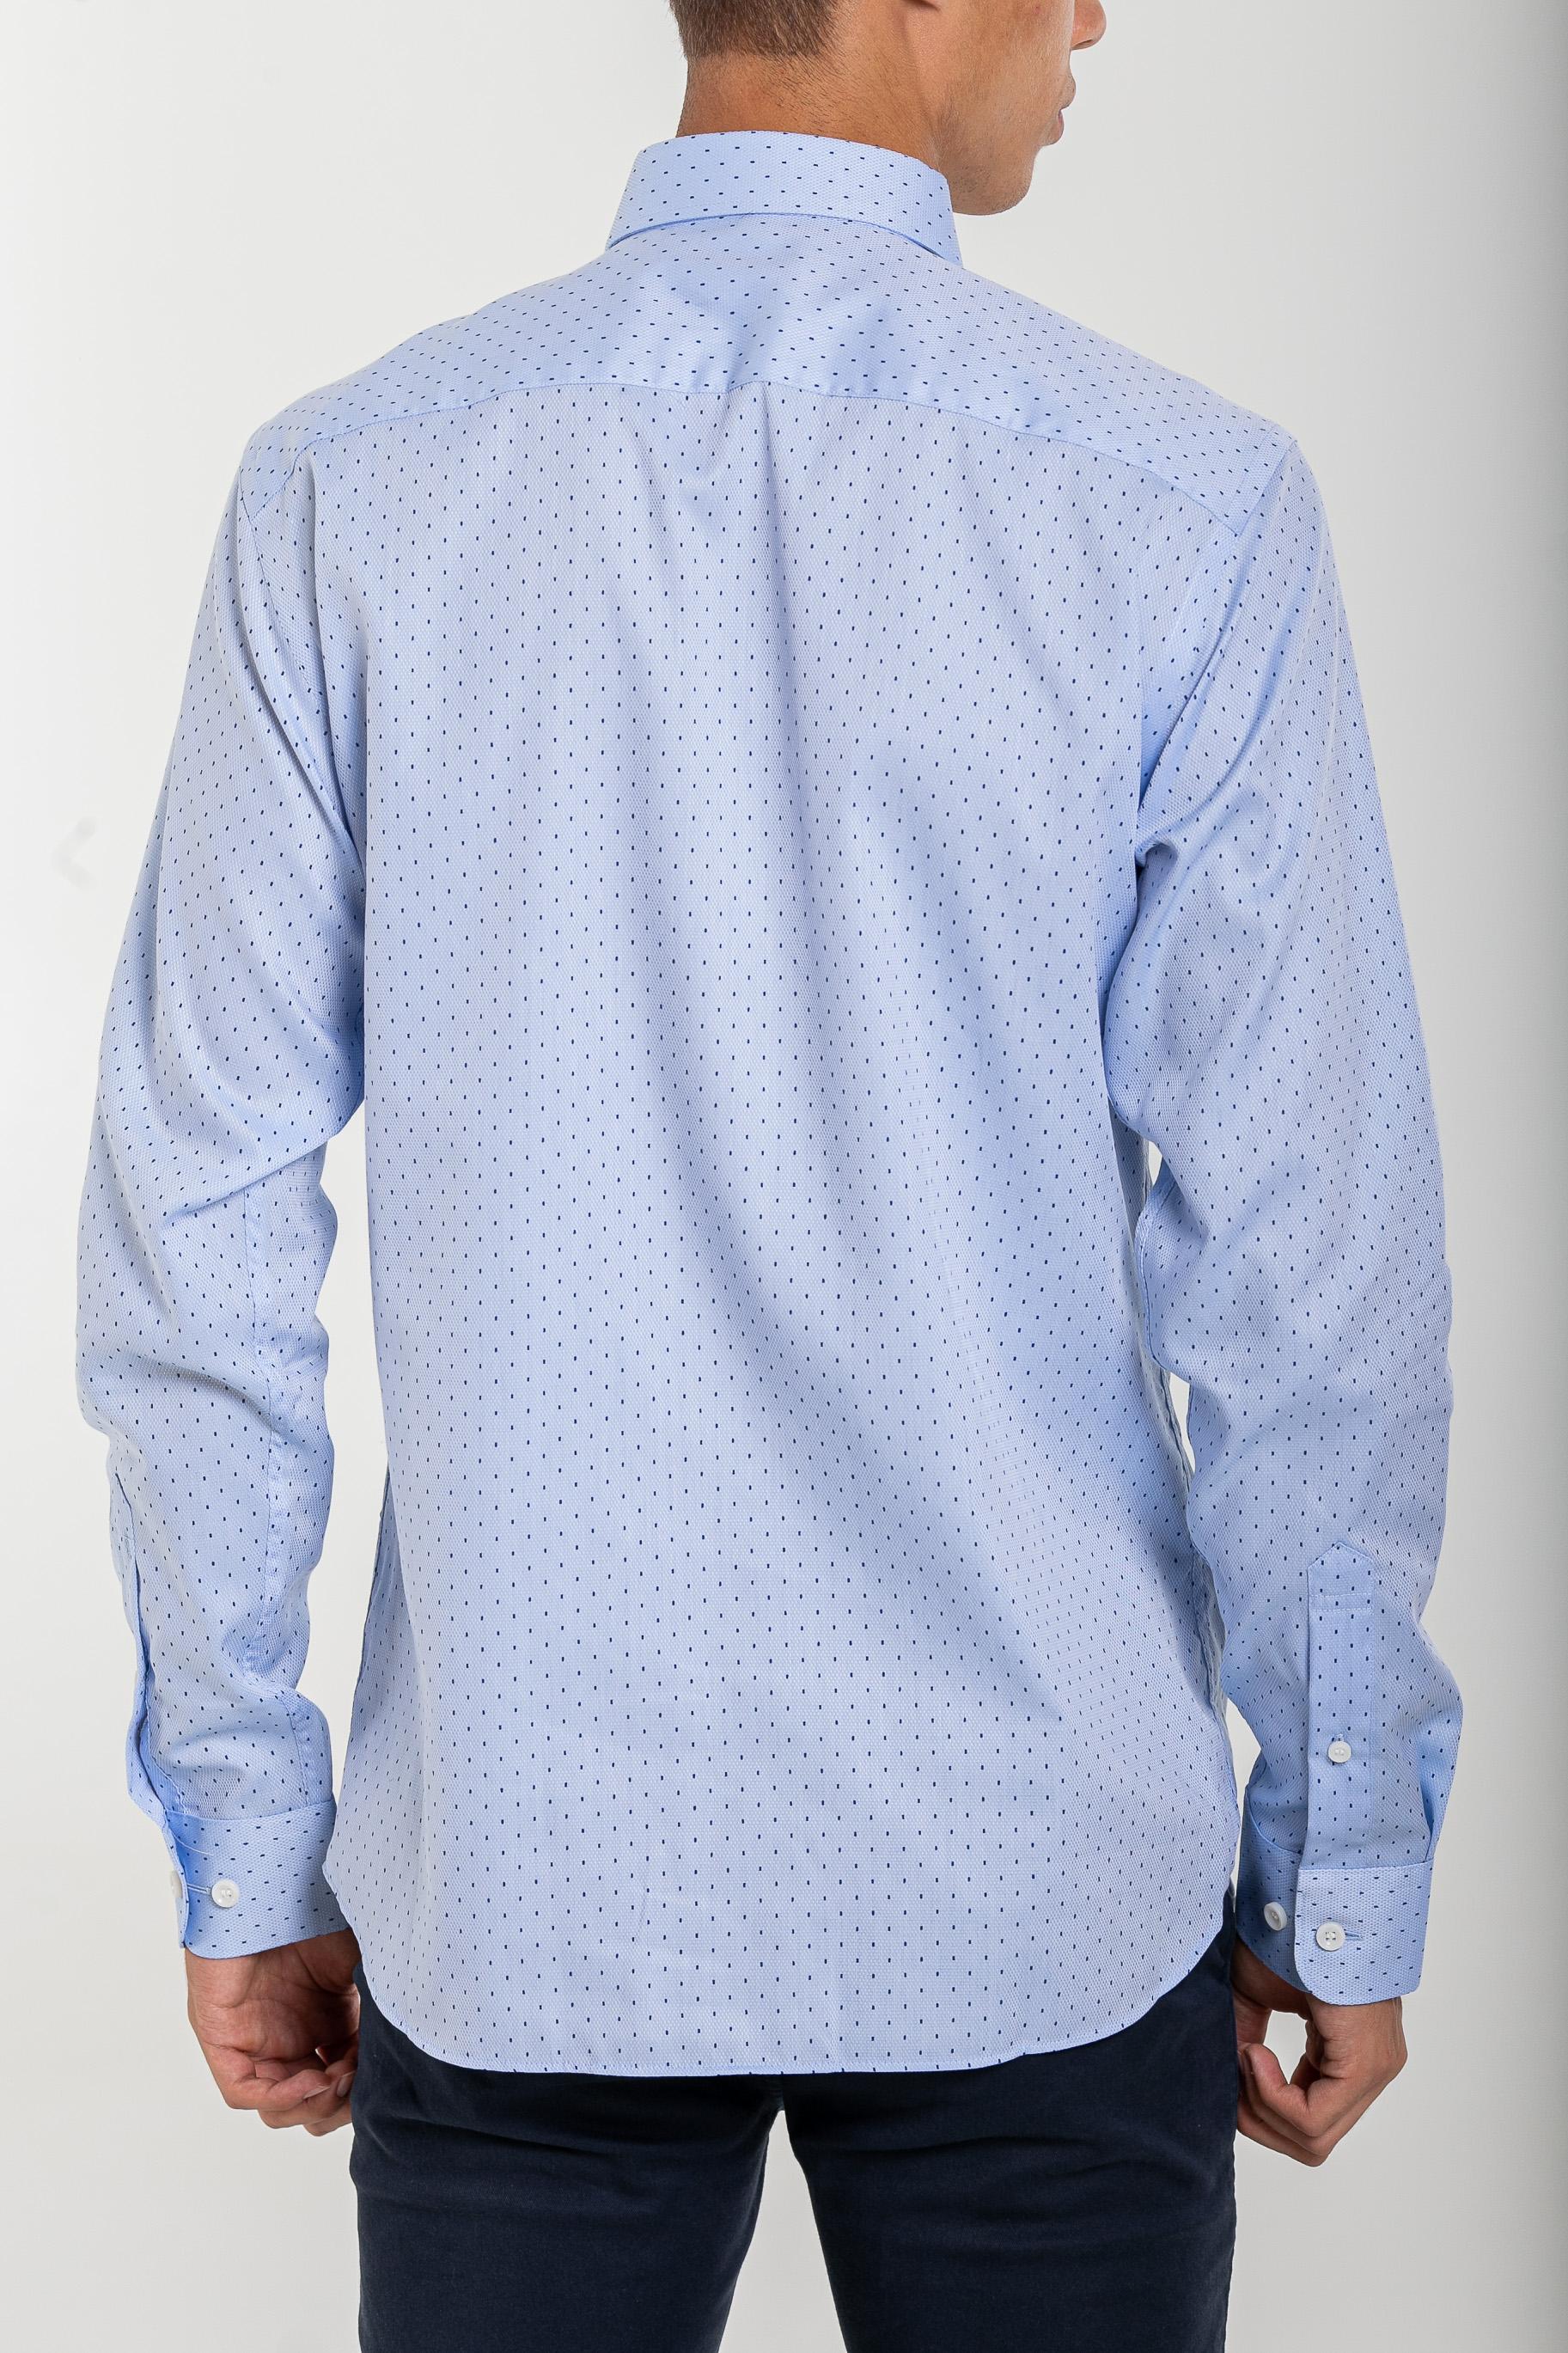 Рубашка Selected Casual (3045) photo 0